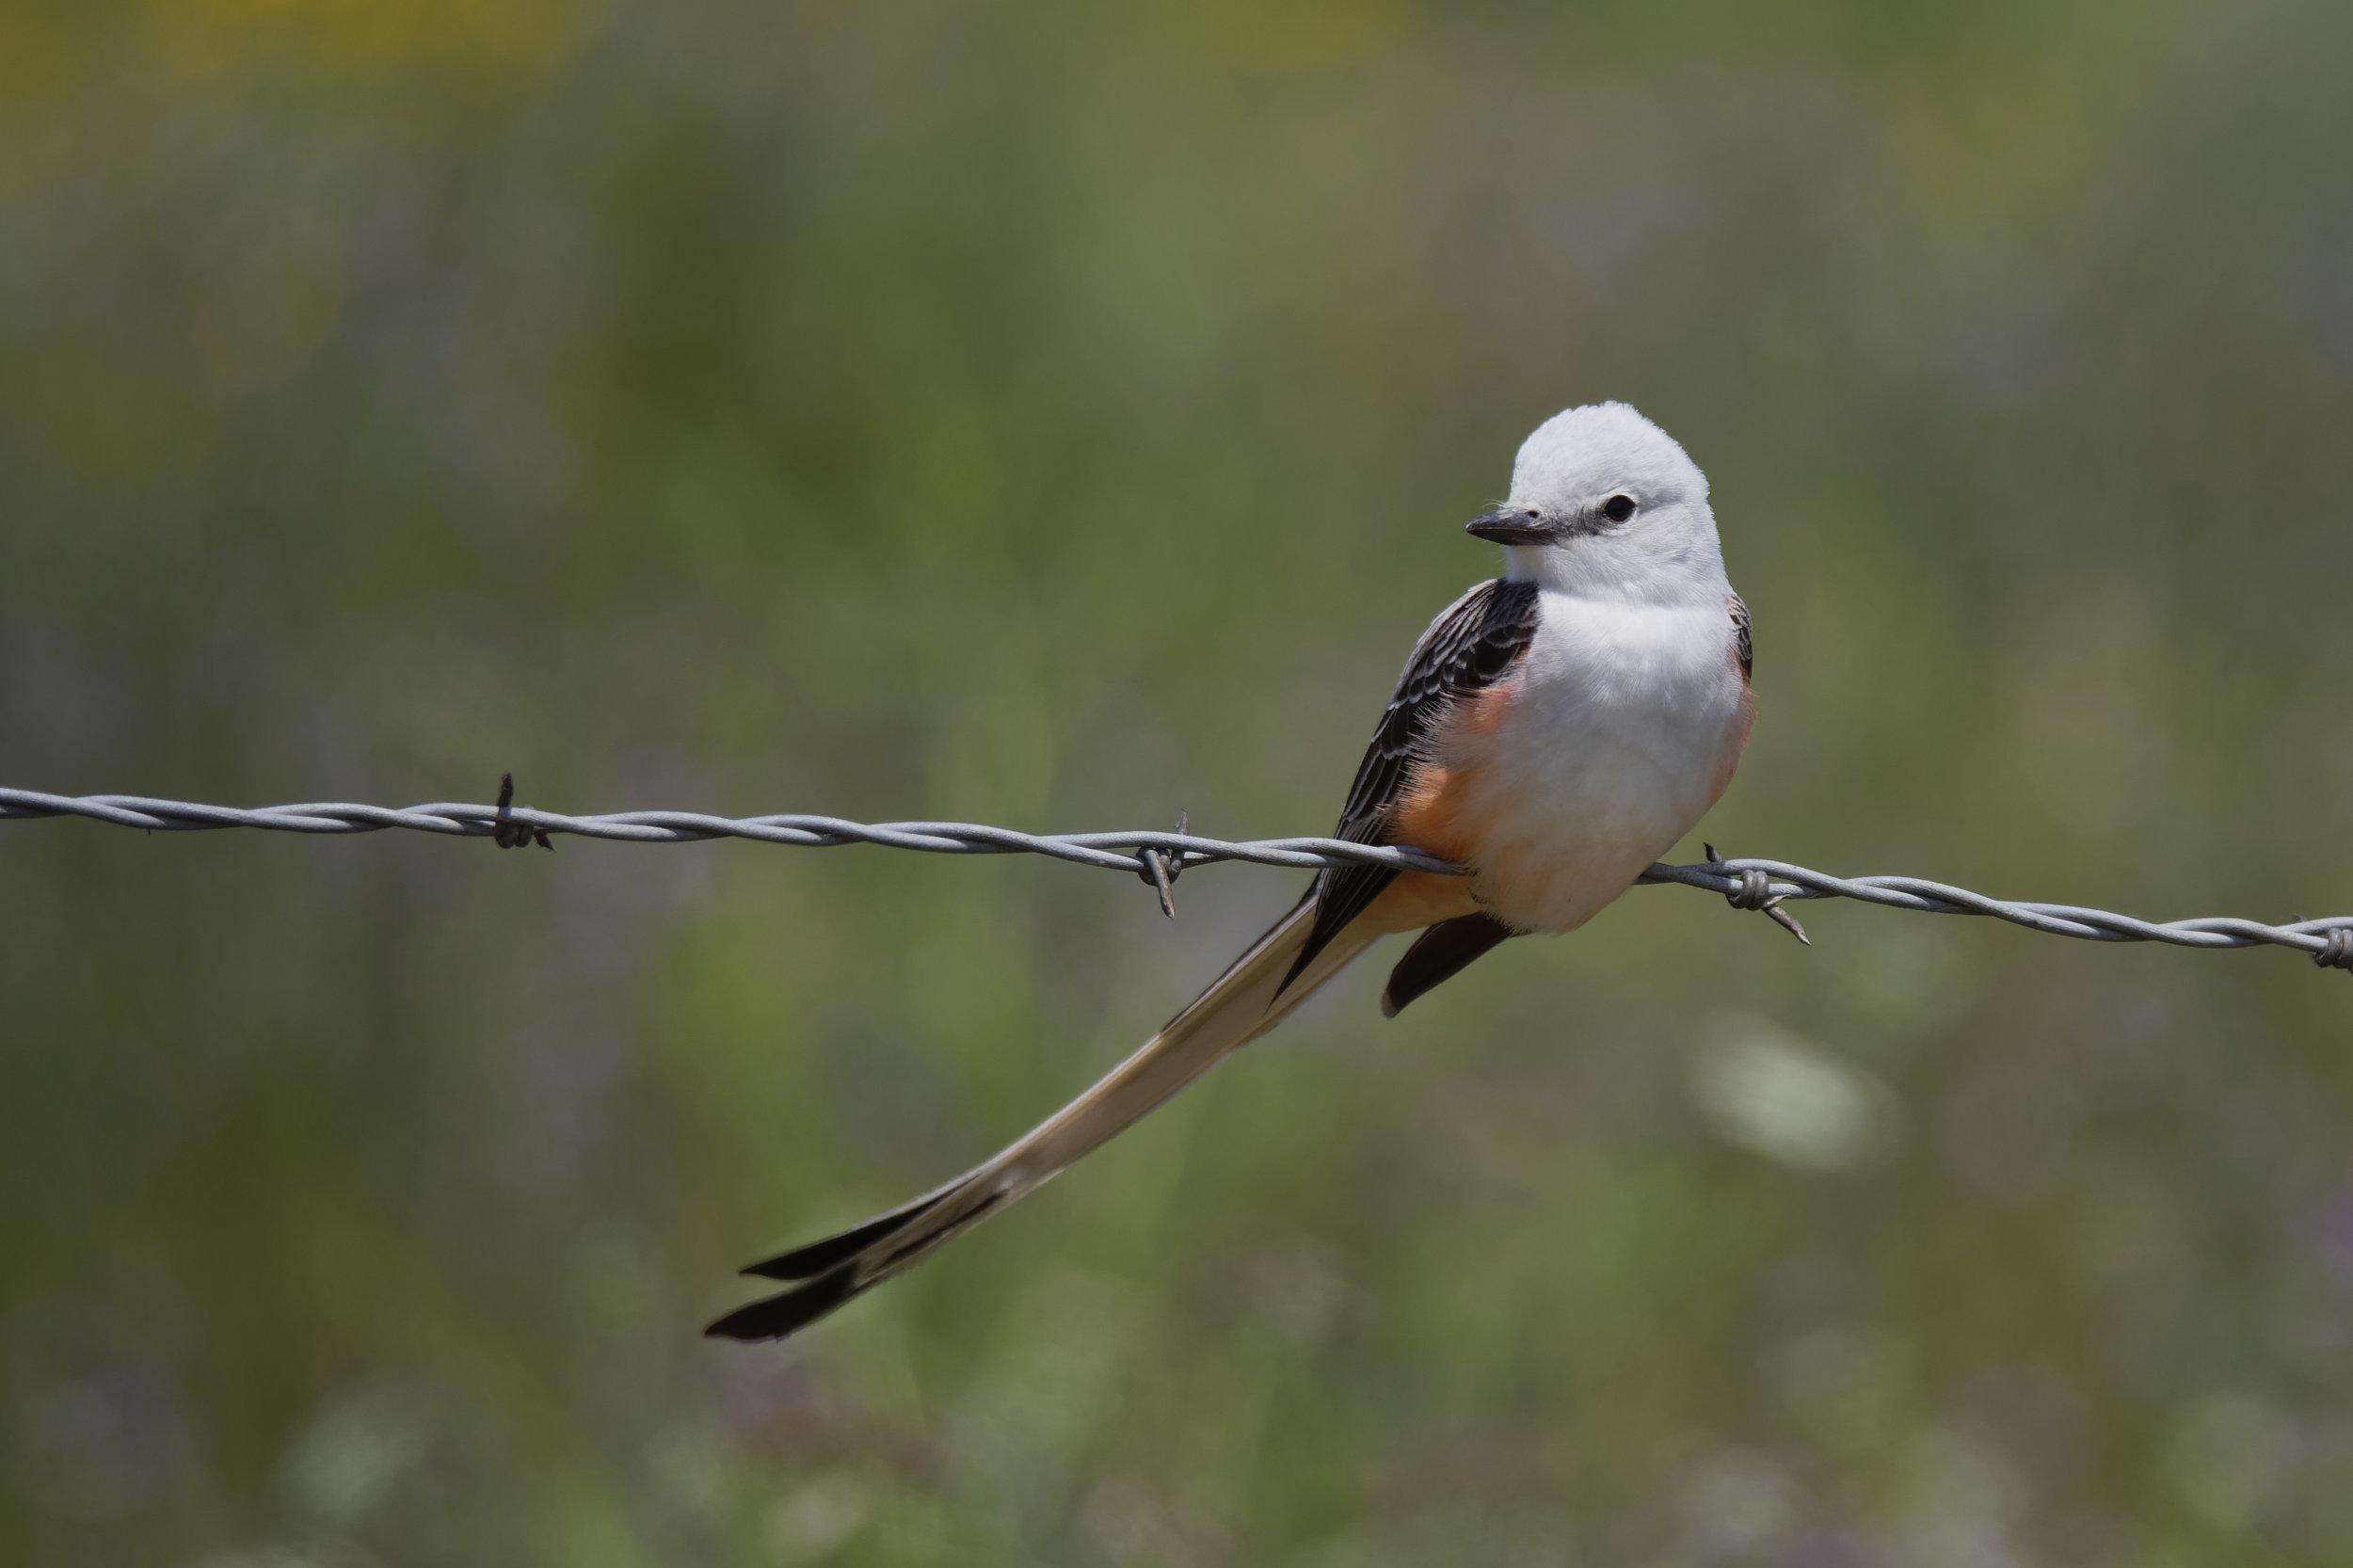 Species: Scissor-tailed Flycatcher Photo Credit: Dina Perry Date: April 2019 Location: Mitchell Lake Audubon Center